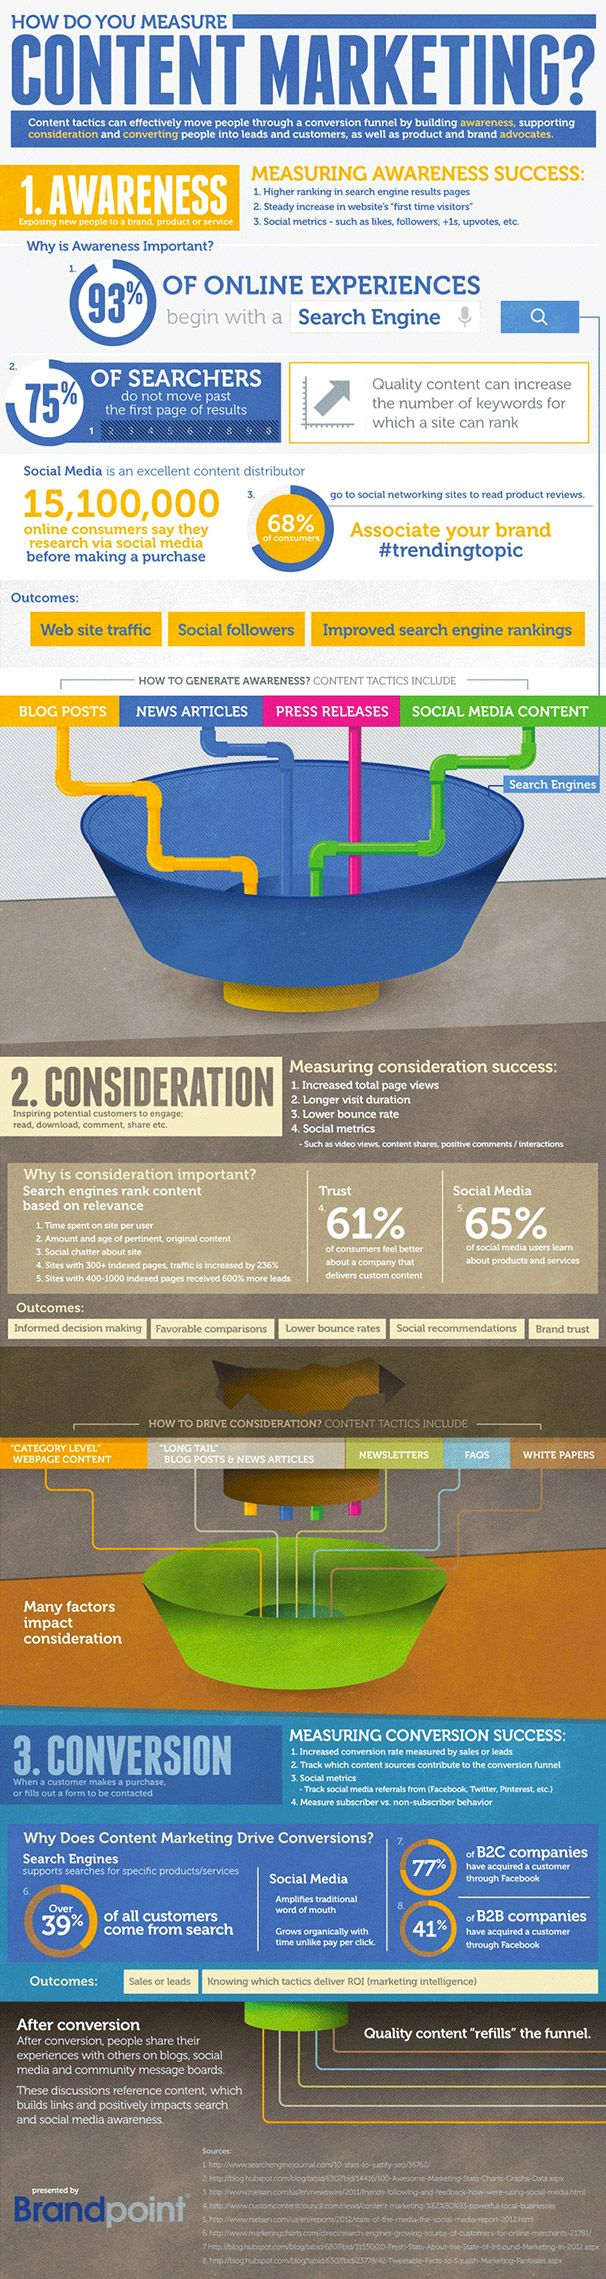 http://www.skande.com/wp-content/uploads/2013/07/content-marketing.jpg